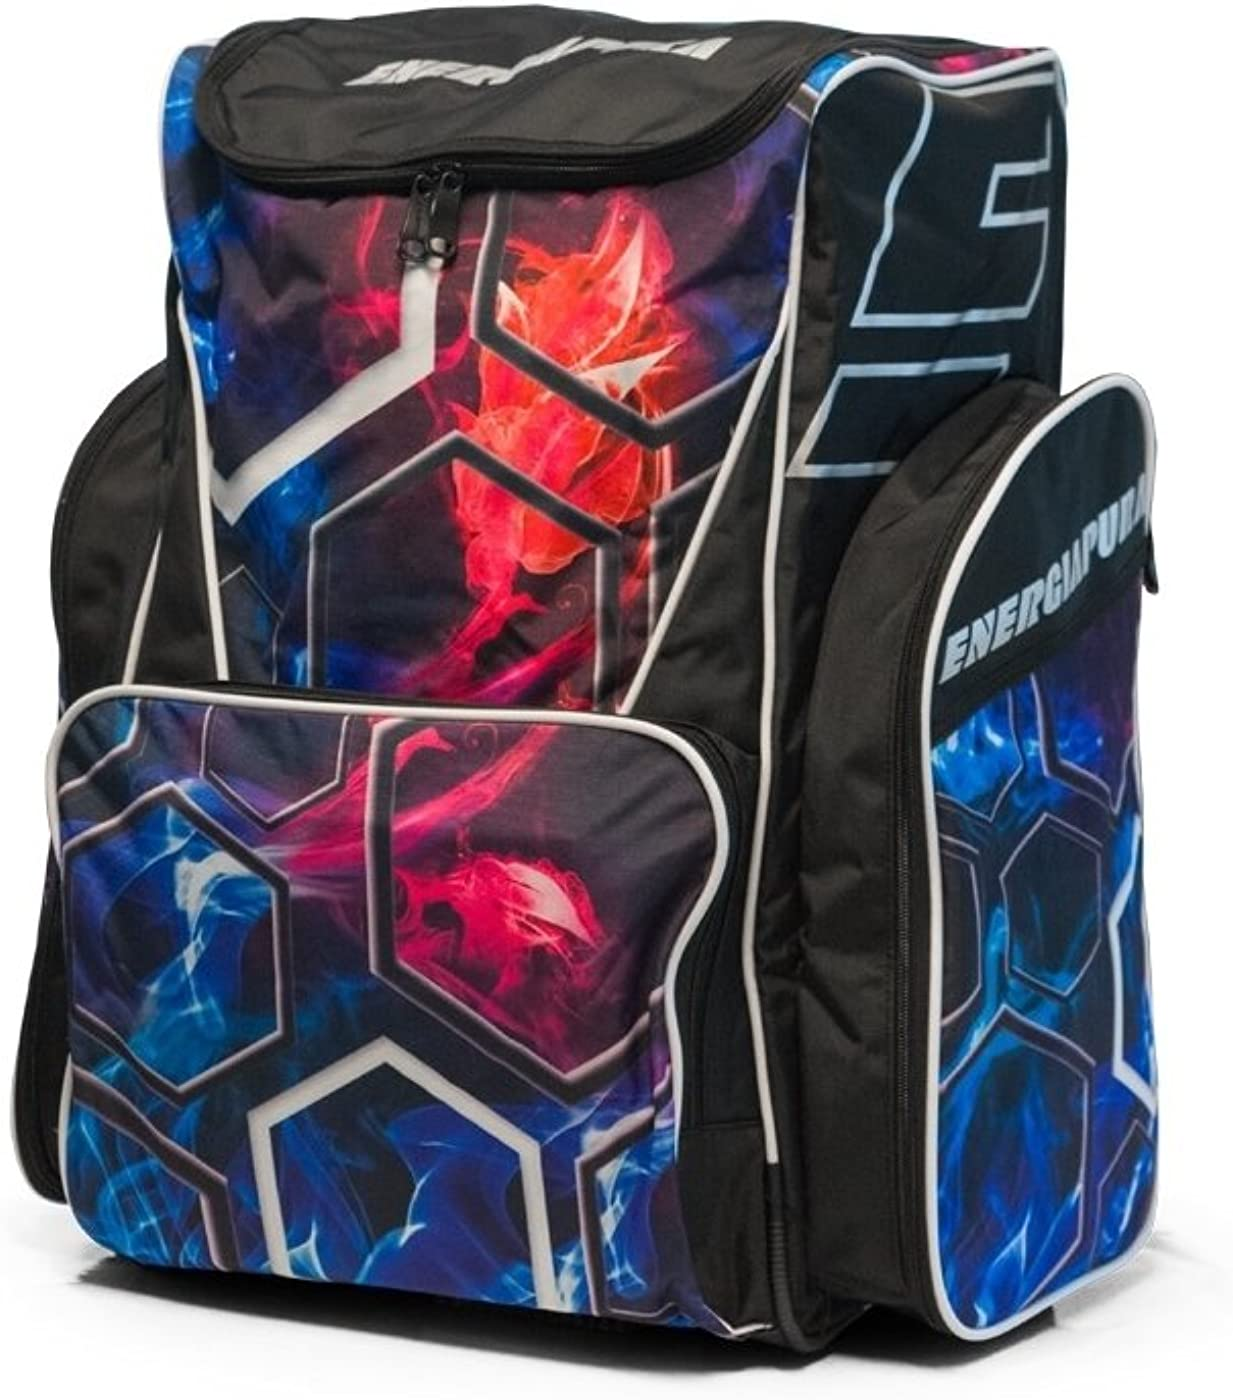 Sac à Dos Racing Energiapura Racer Bag Fashion Sr Smoke